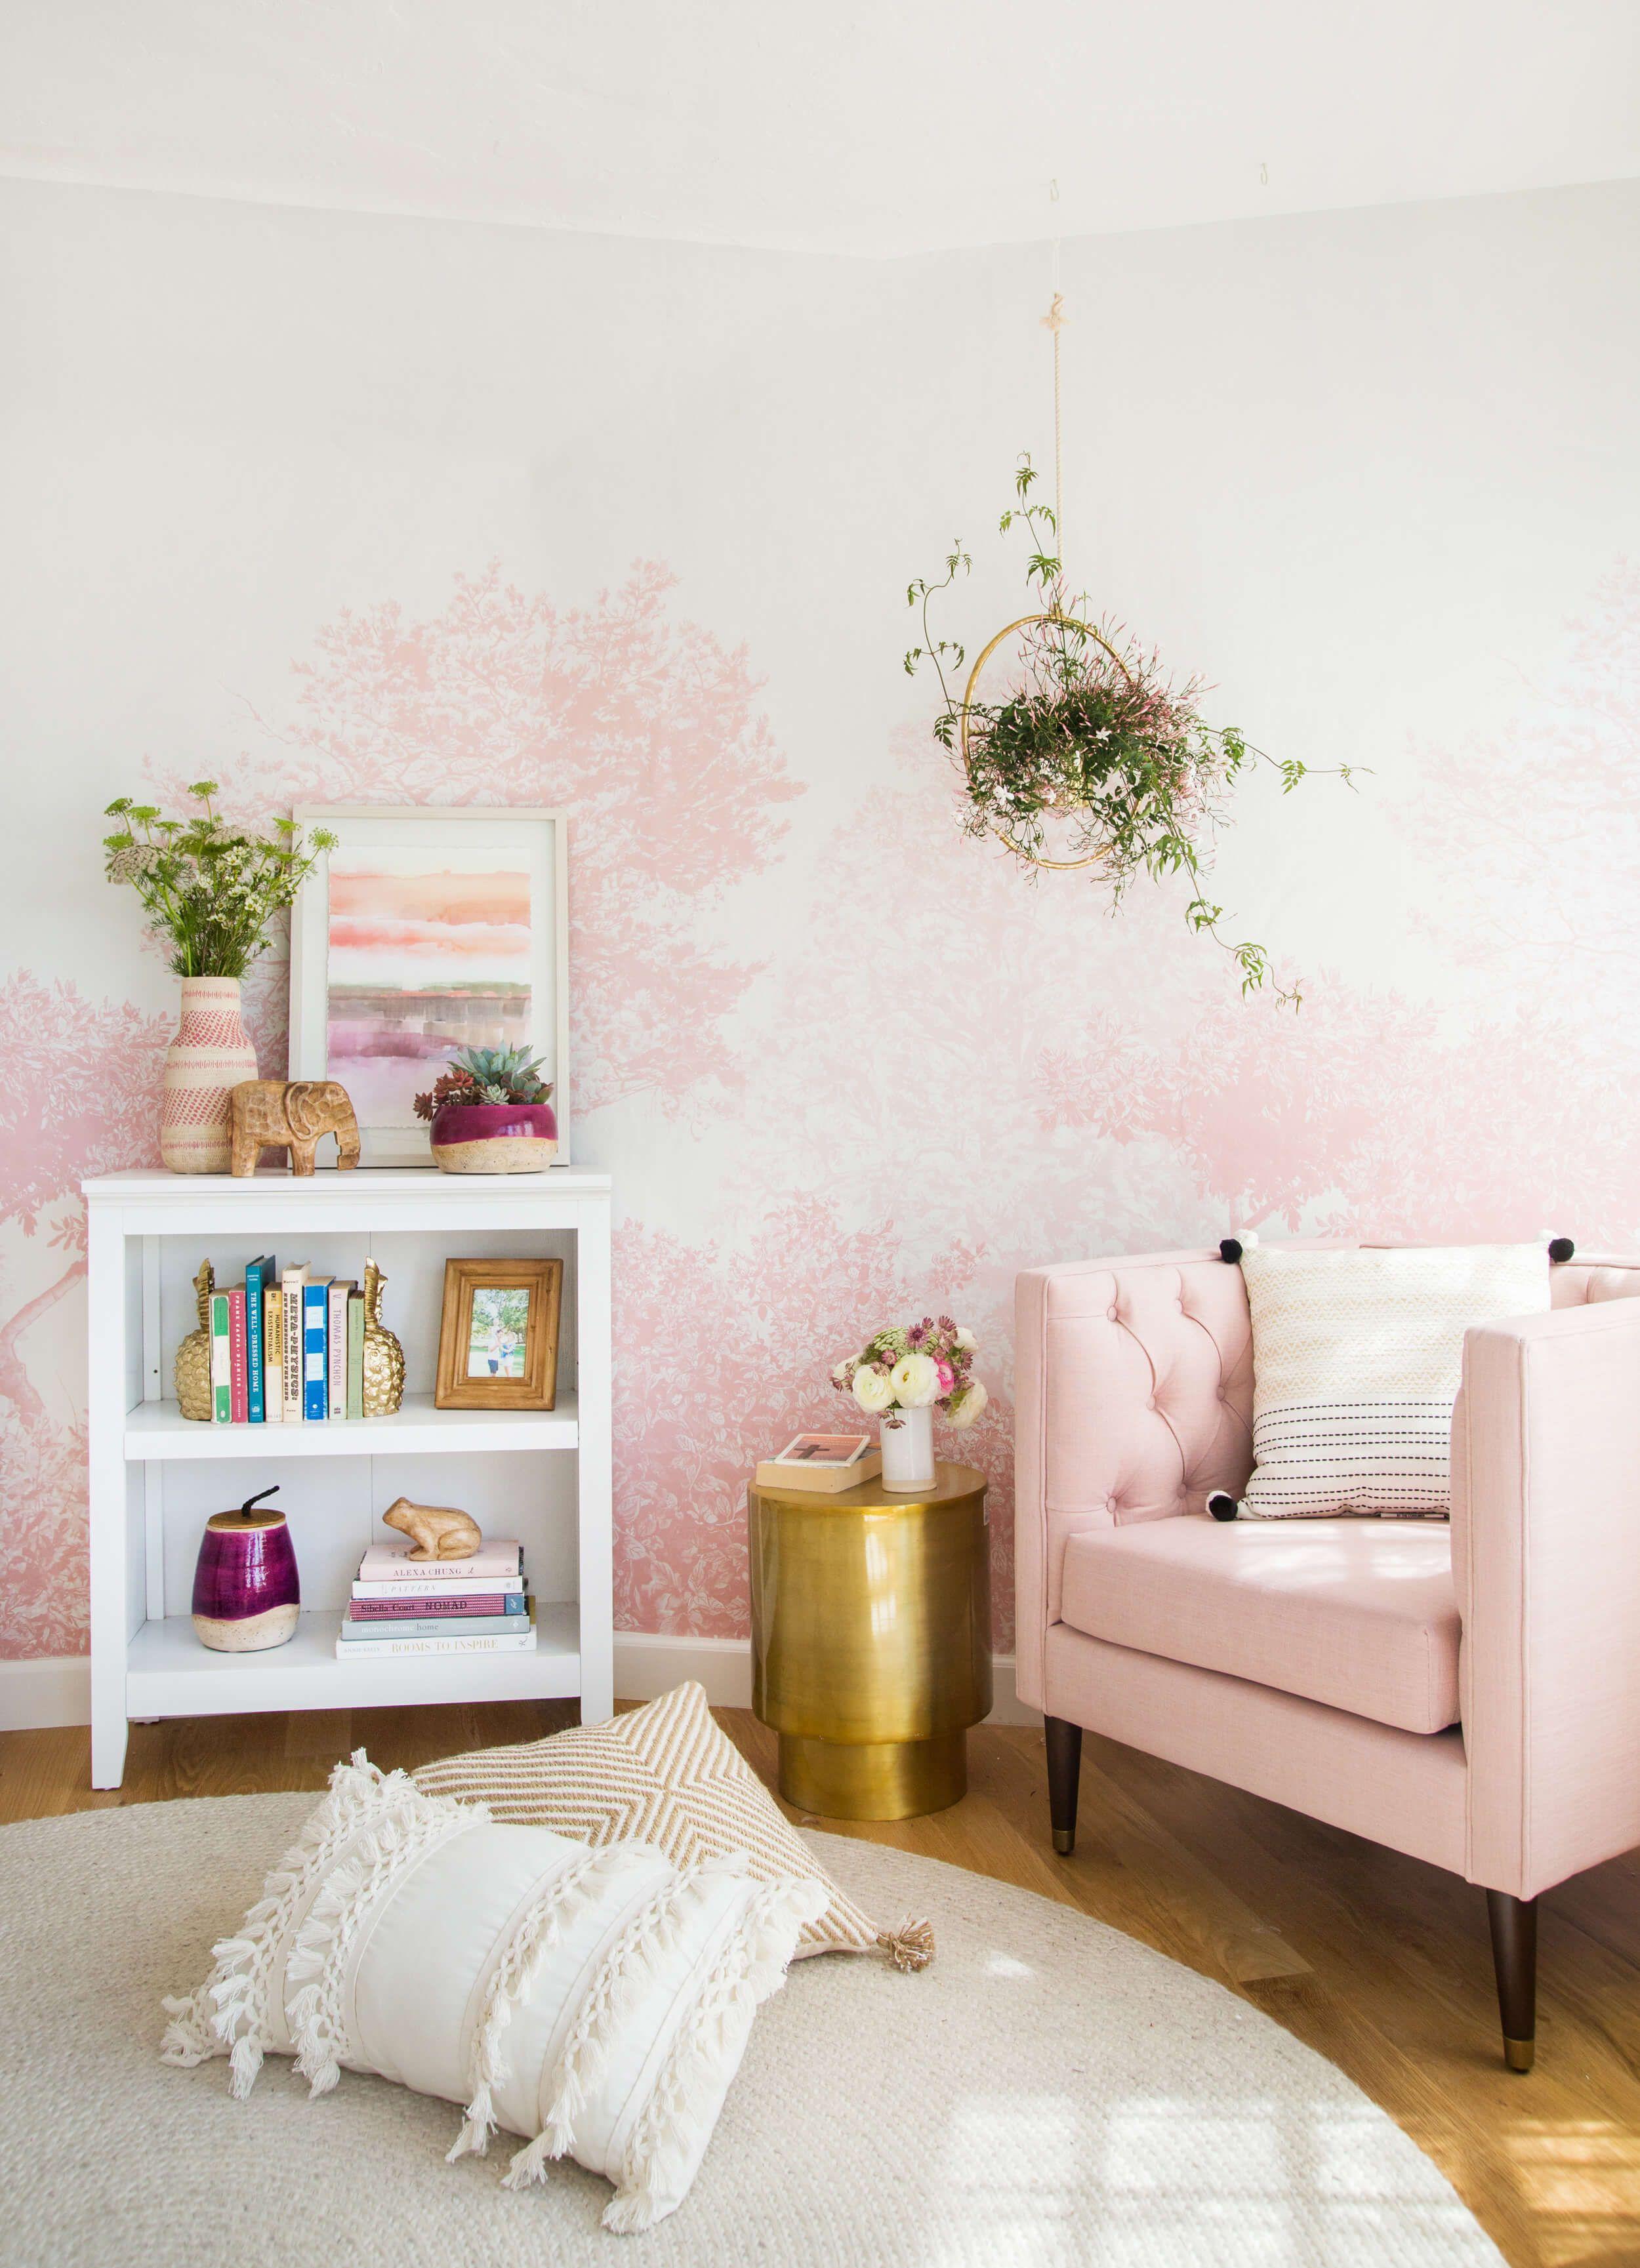 Target Living Room Furniture: How Splurge-worthy Wallpaper Or Tile Can Make A Room